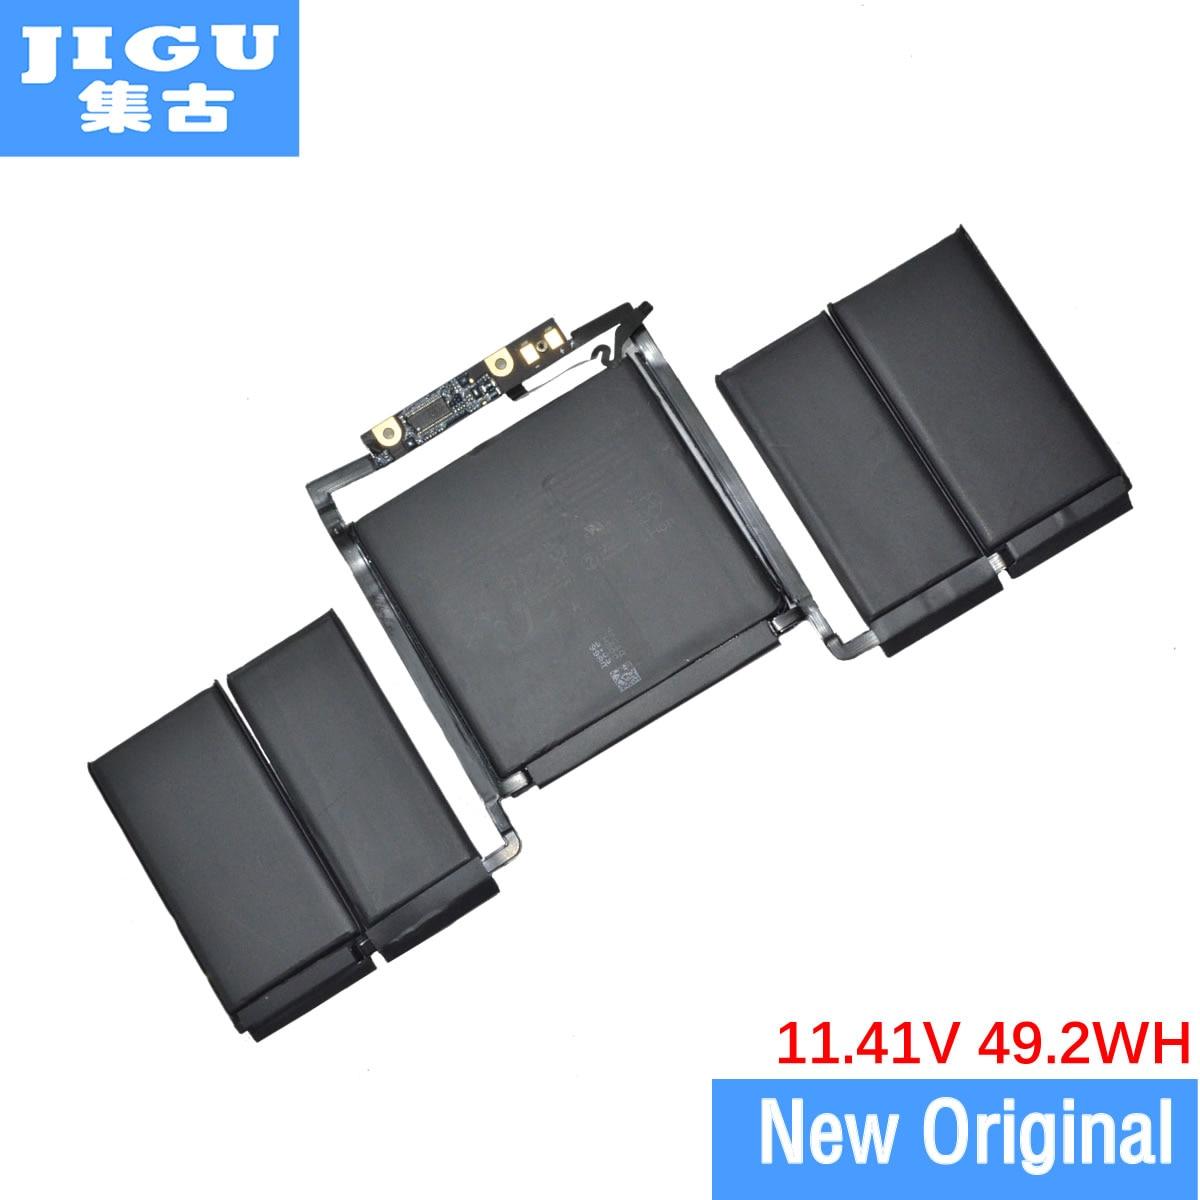 Аккумулятор JIGU для ноутбука APPLE A1819 A1706 MNQG2CH/A MLH12CH/A, 11,4 в, 49.2WH, оригинальный, для MacBook Pro 13